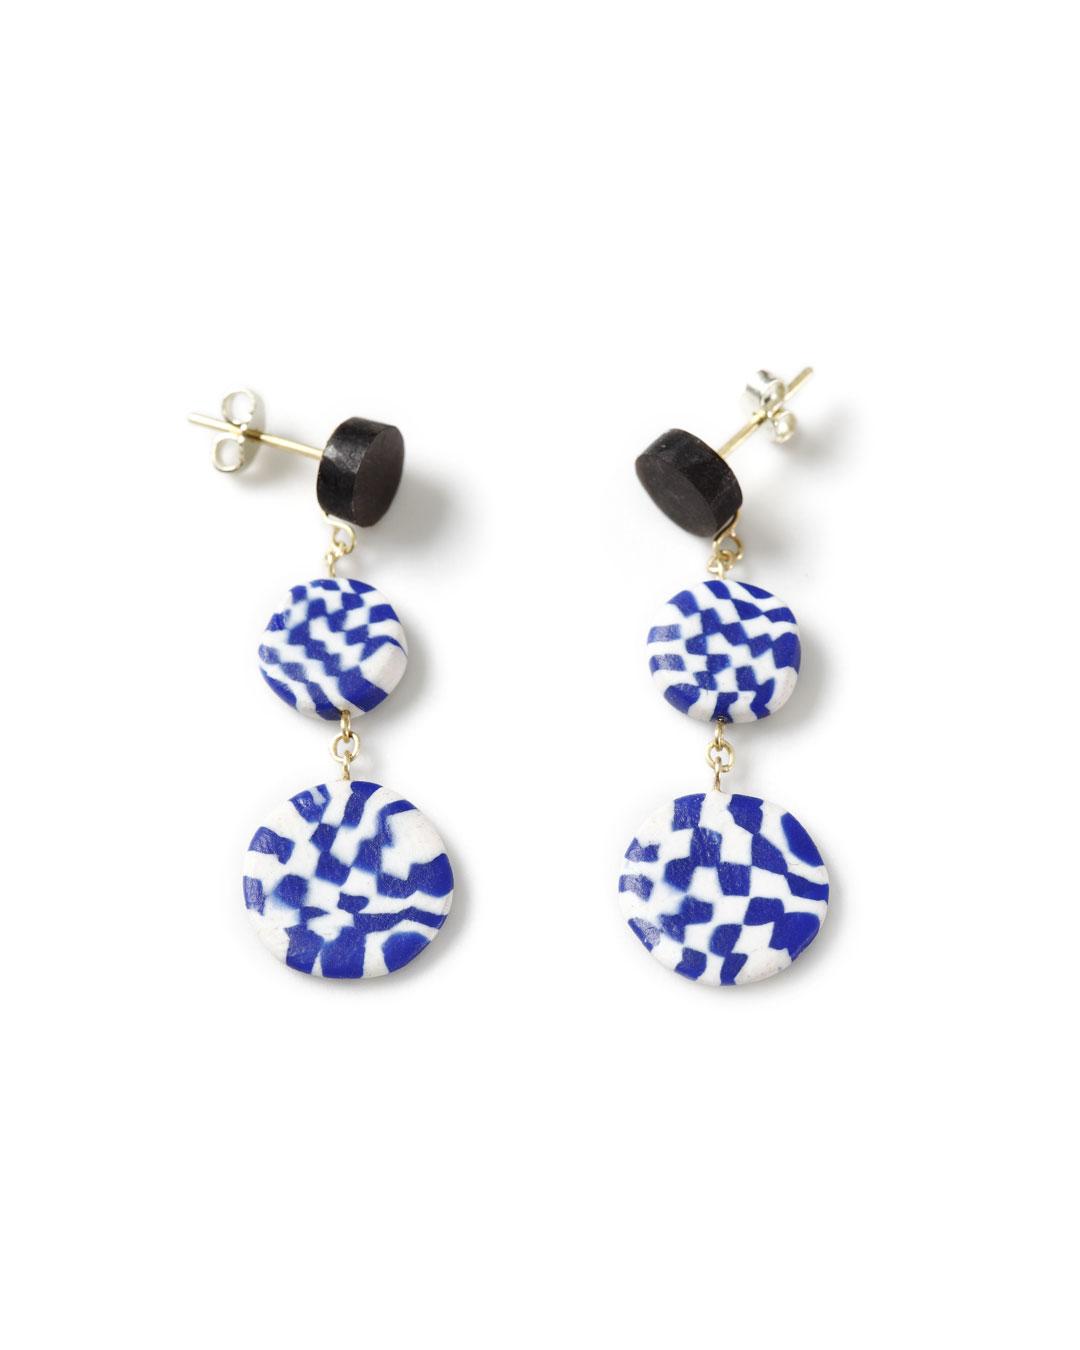 Julie Mollenhauer, untitled, 2012, earrings; Fimo, gold, horn, 37 x 14 x 3 mm, €880